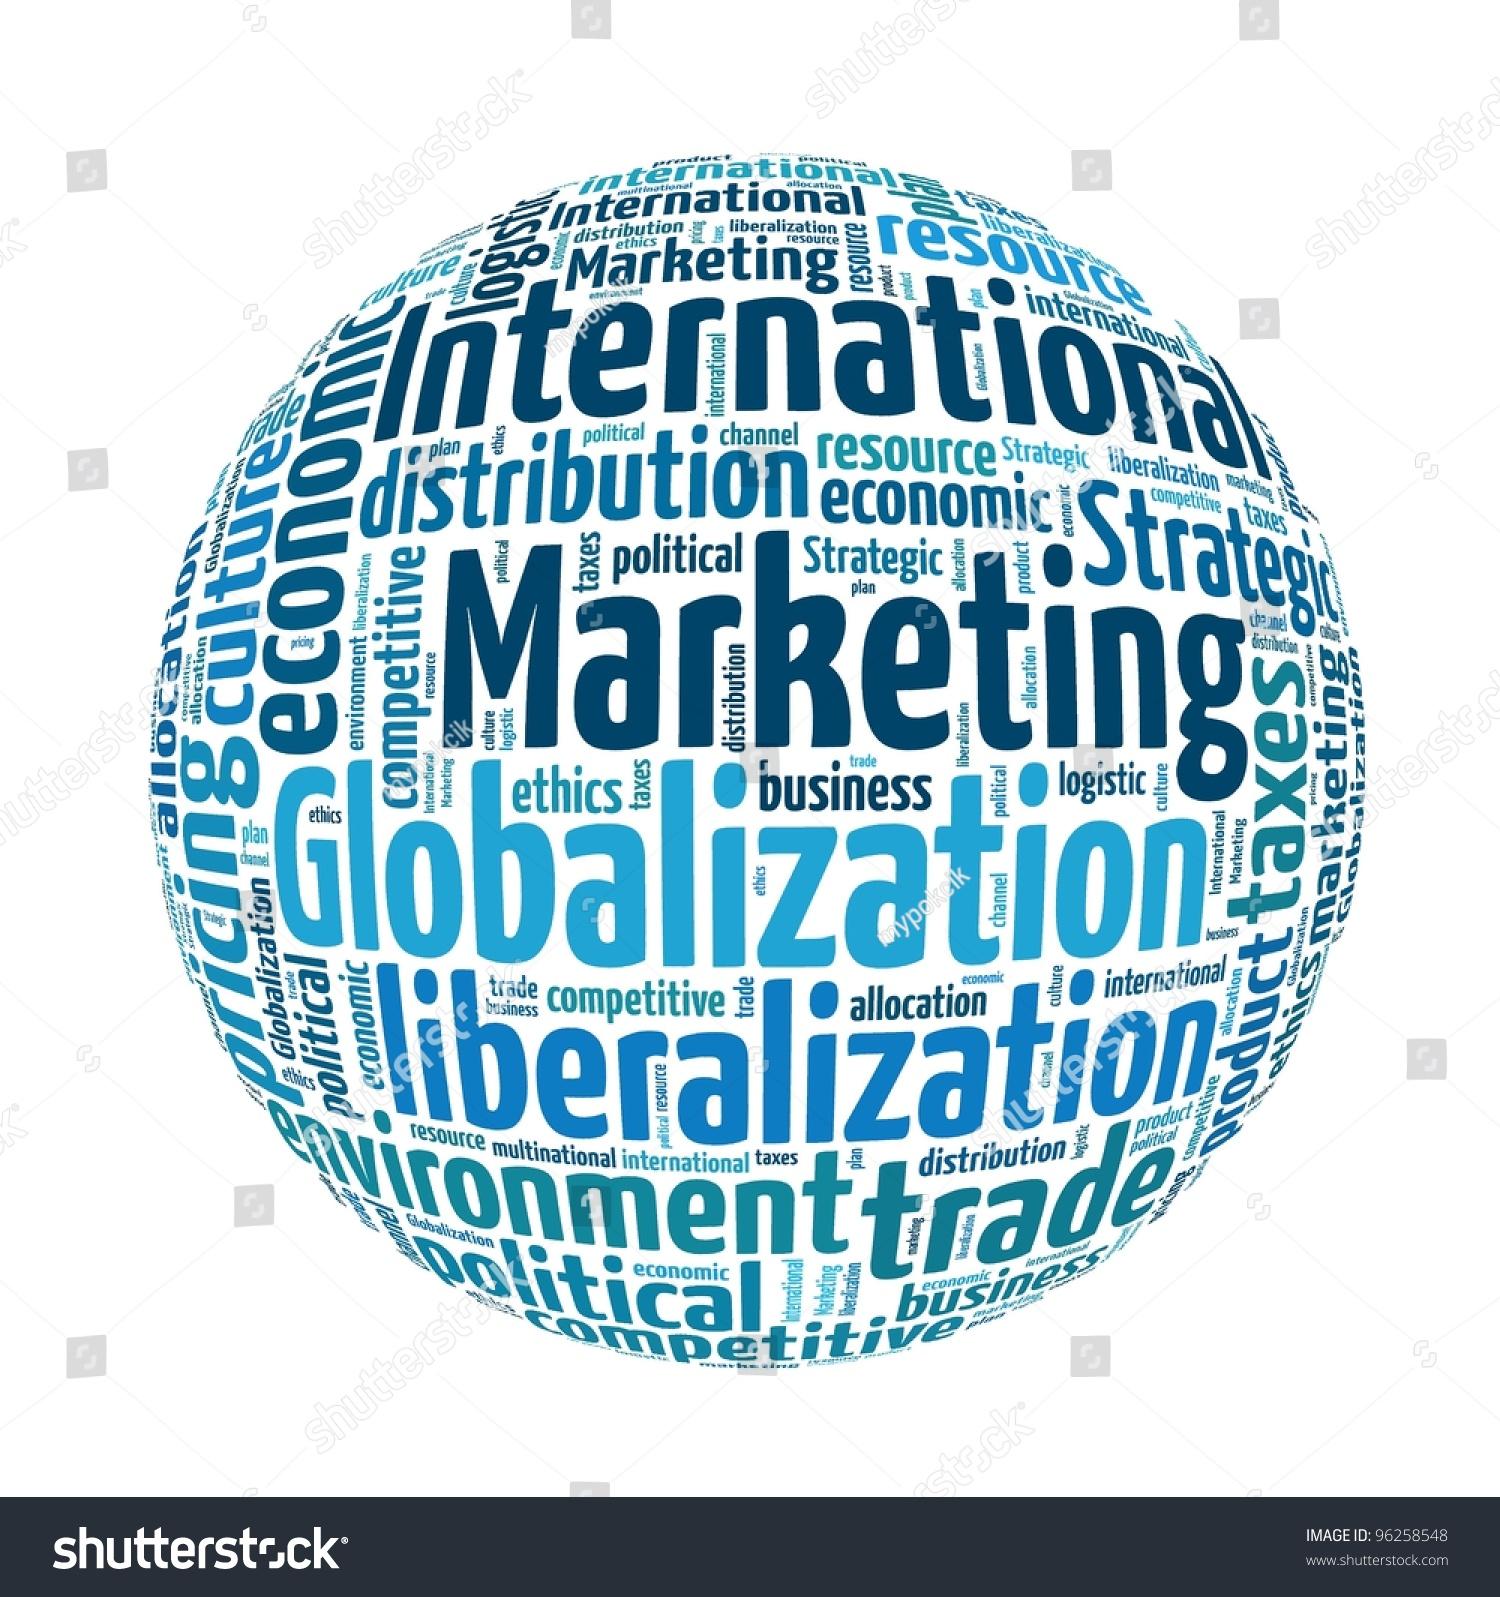 International Marketing in word collage